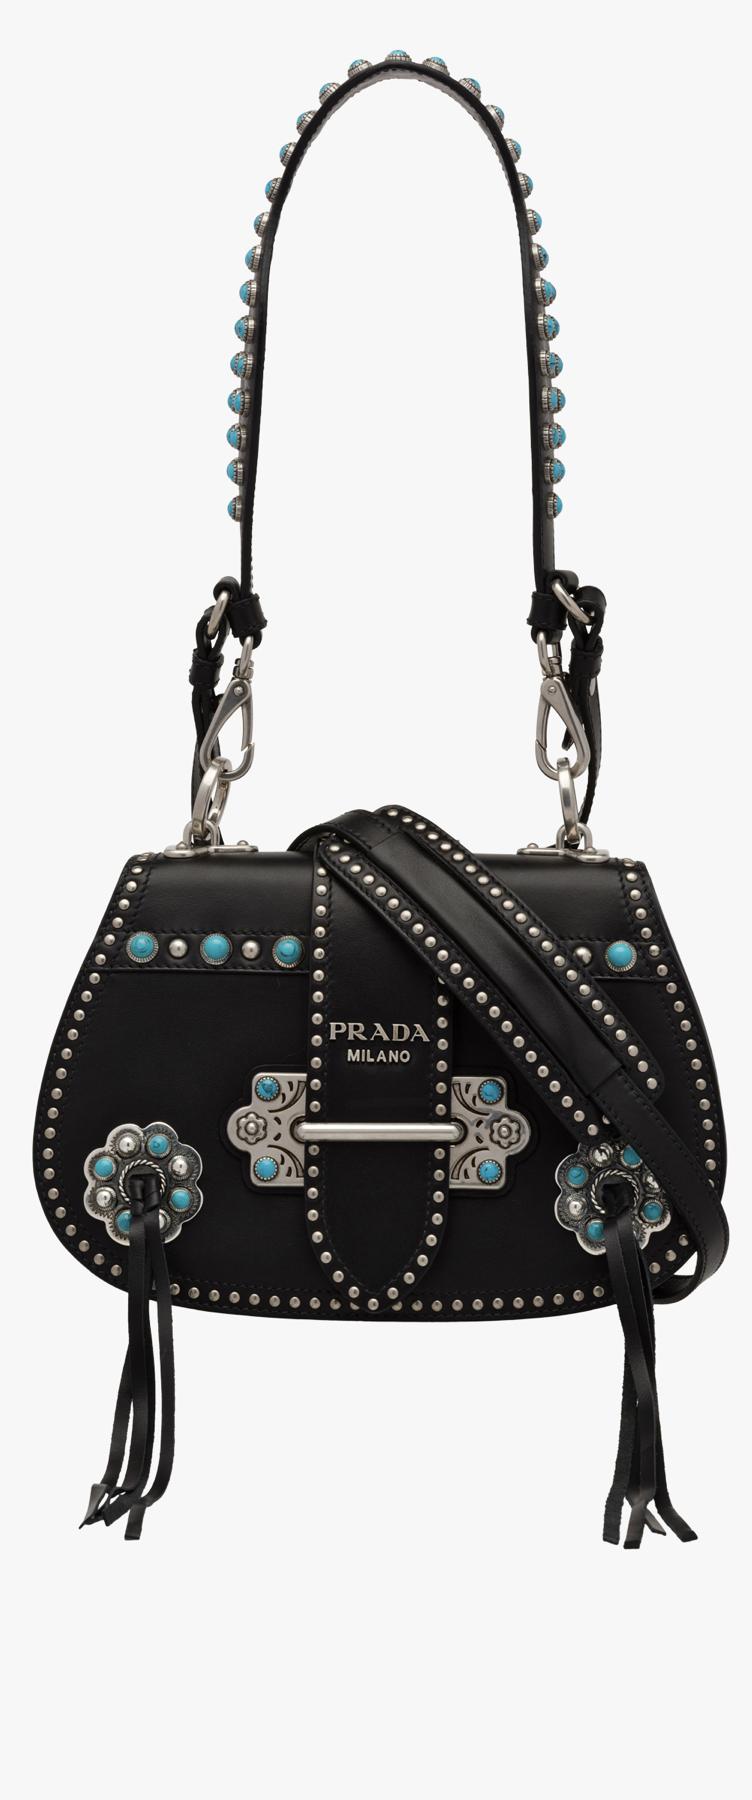 e6af20f333 Prada western handbag black silver and turquoise | ACCESSORIES SHOW ...